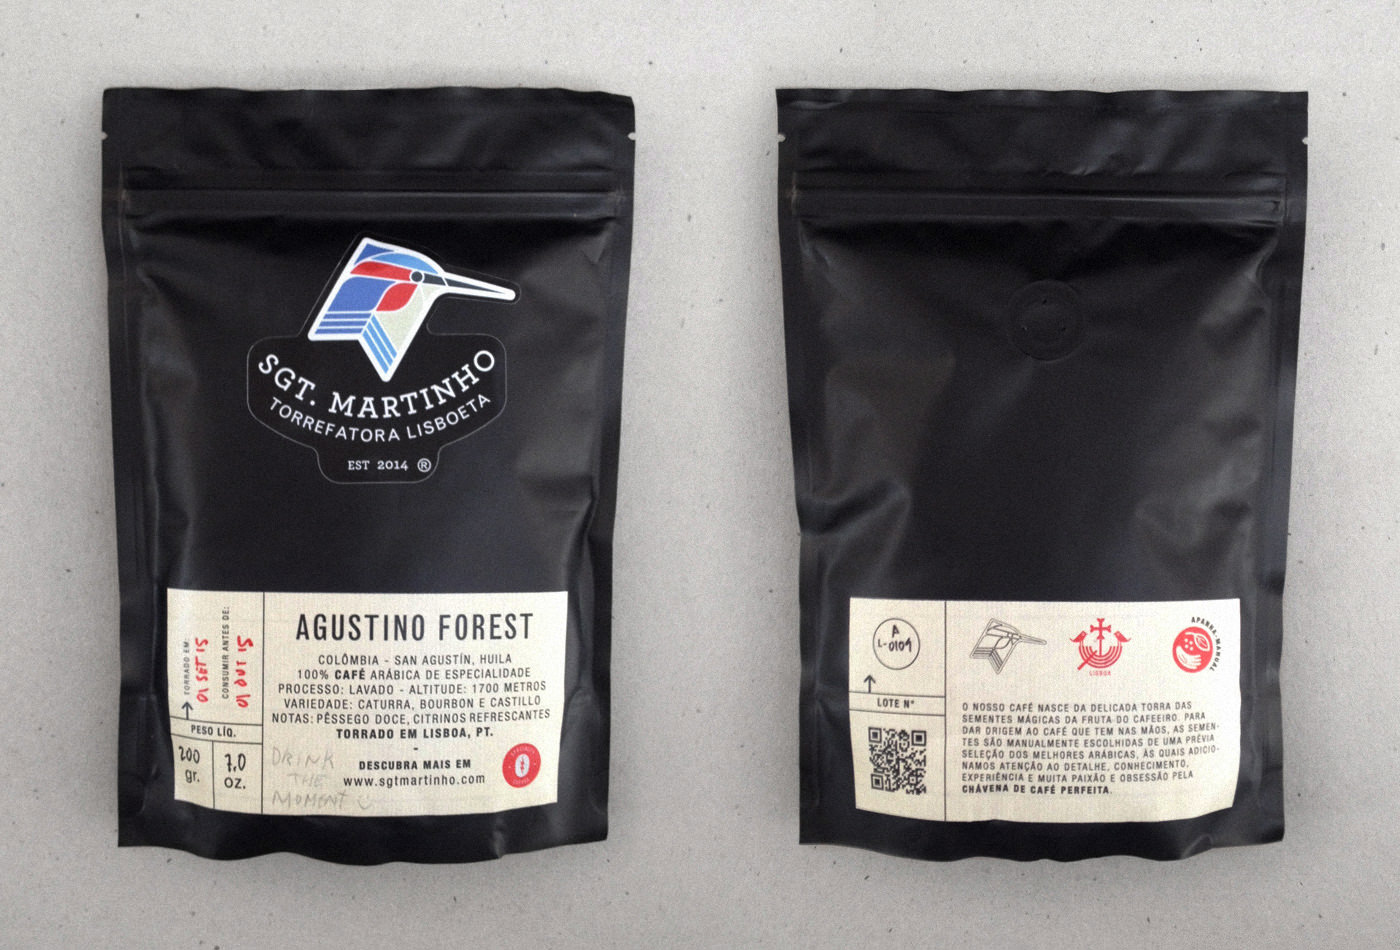 sgtm-arti direction-sargento-martinho-coffee-brand-marks-branding-logo-vacaliebres-labels